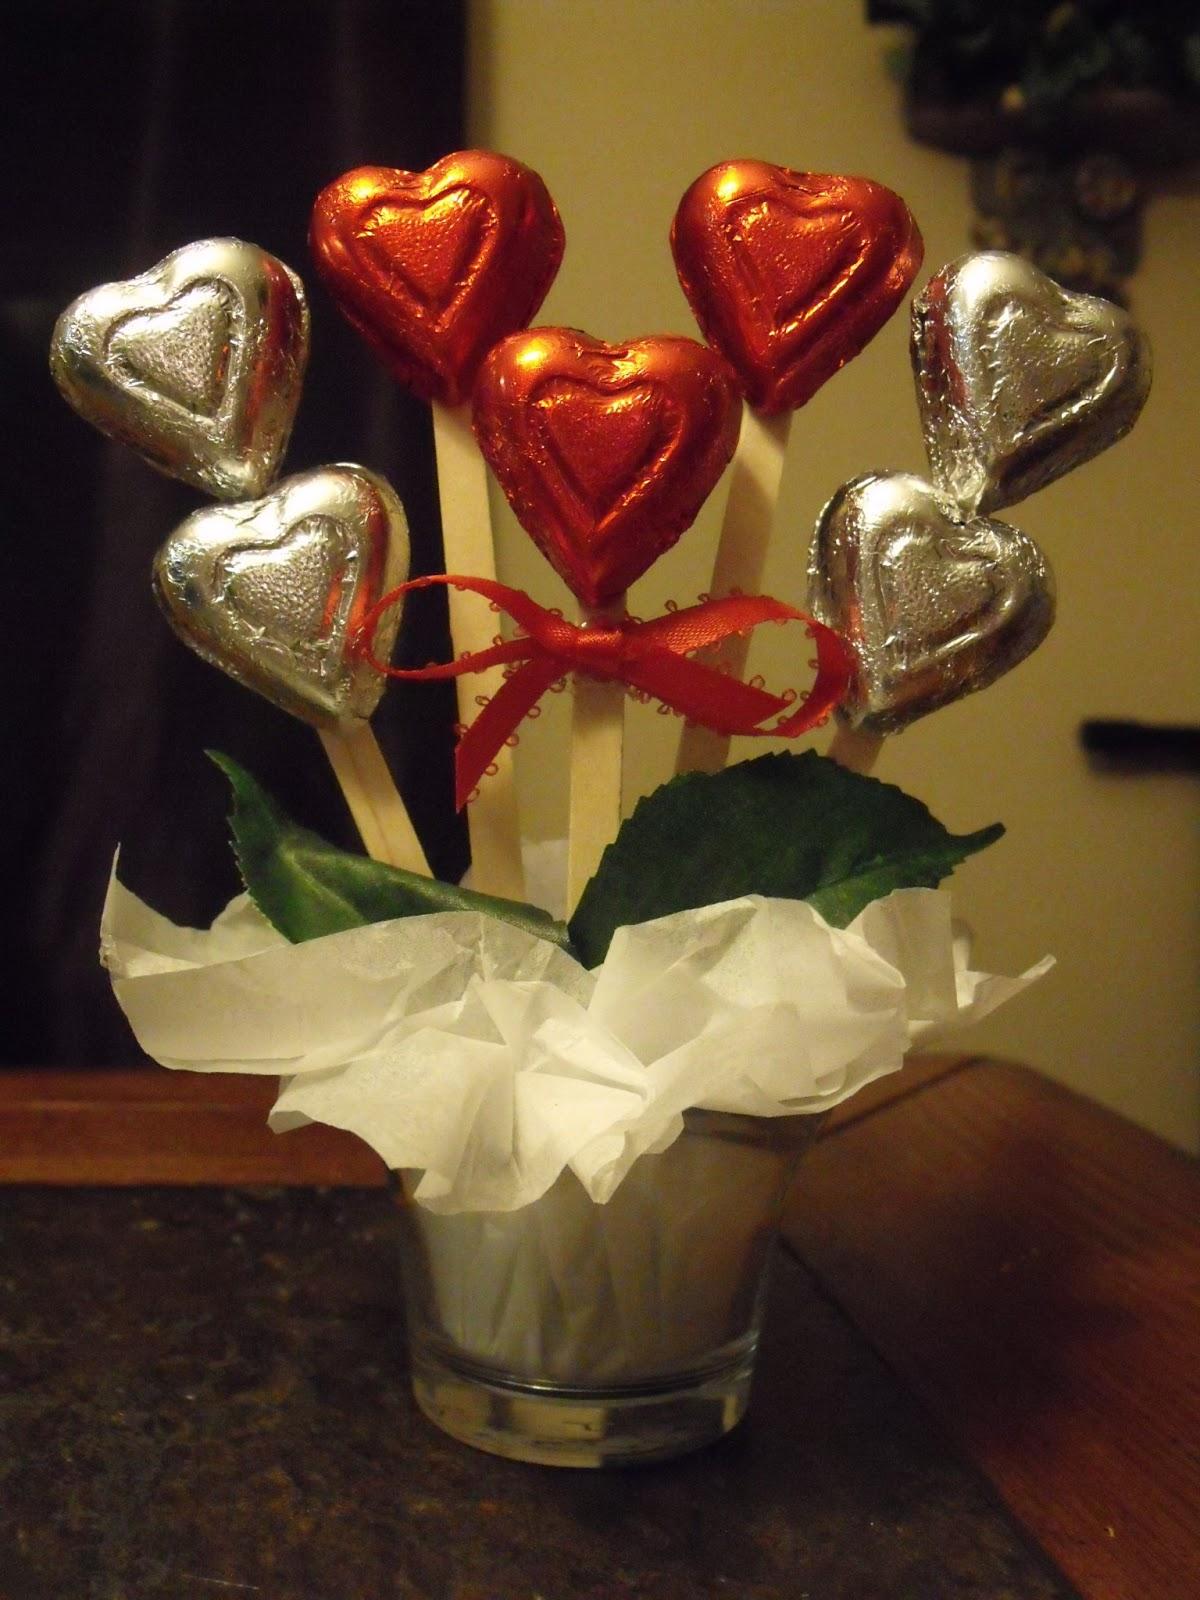 A Chocolate Bouquet Make An Adorable Little Chocolate Hearts Bouquet